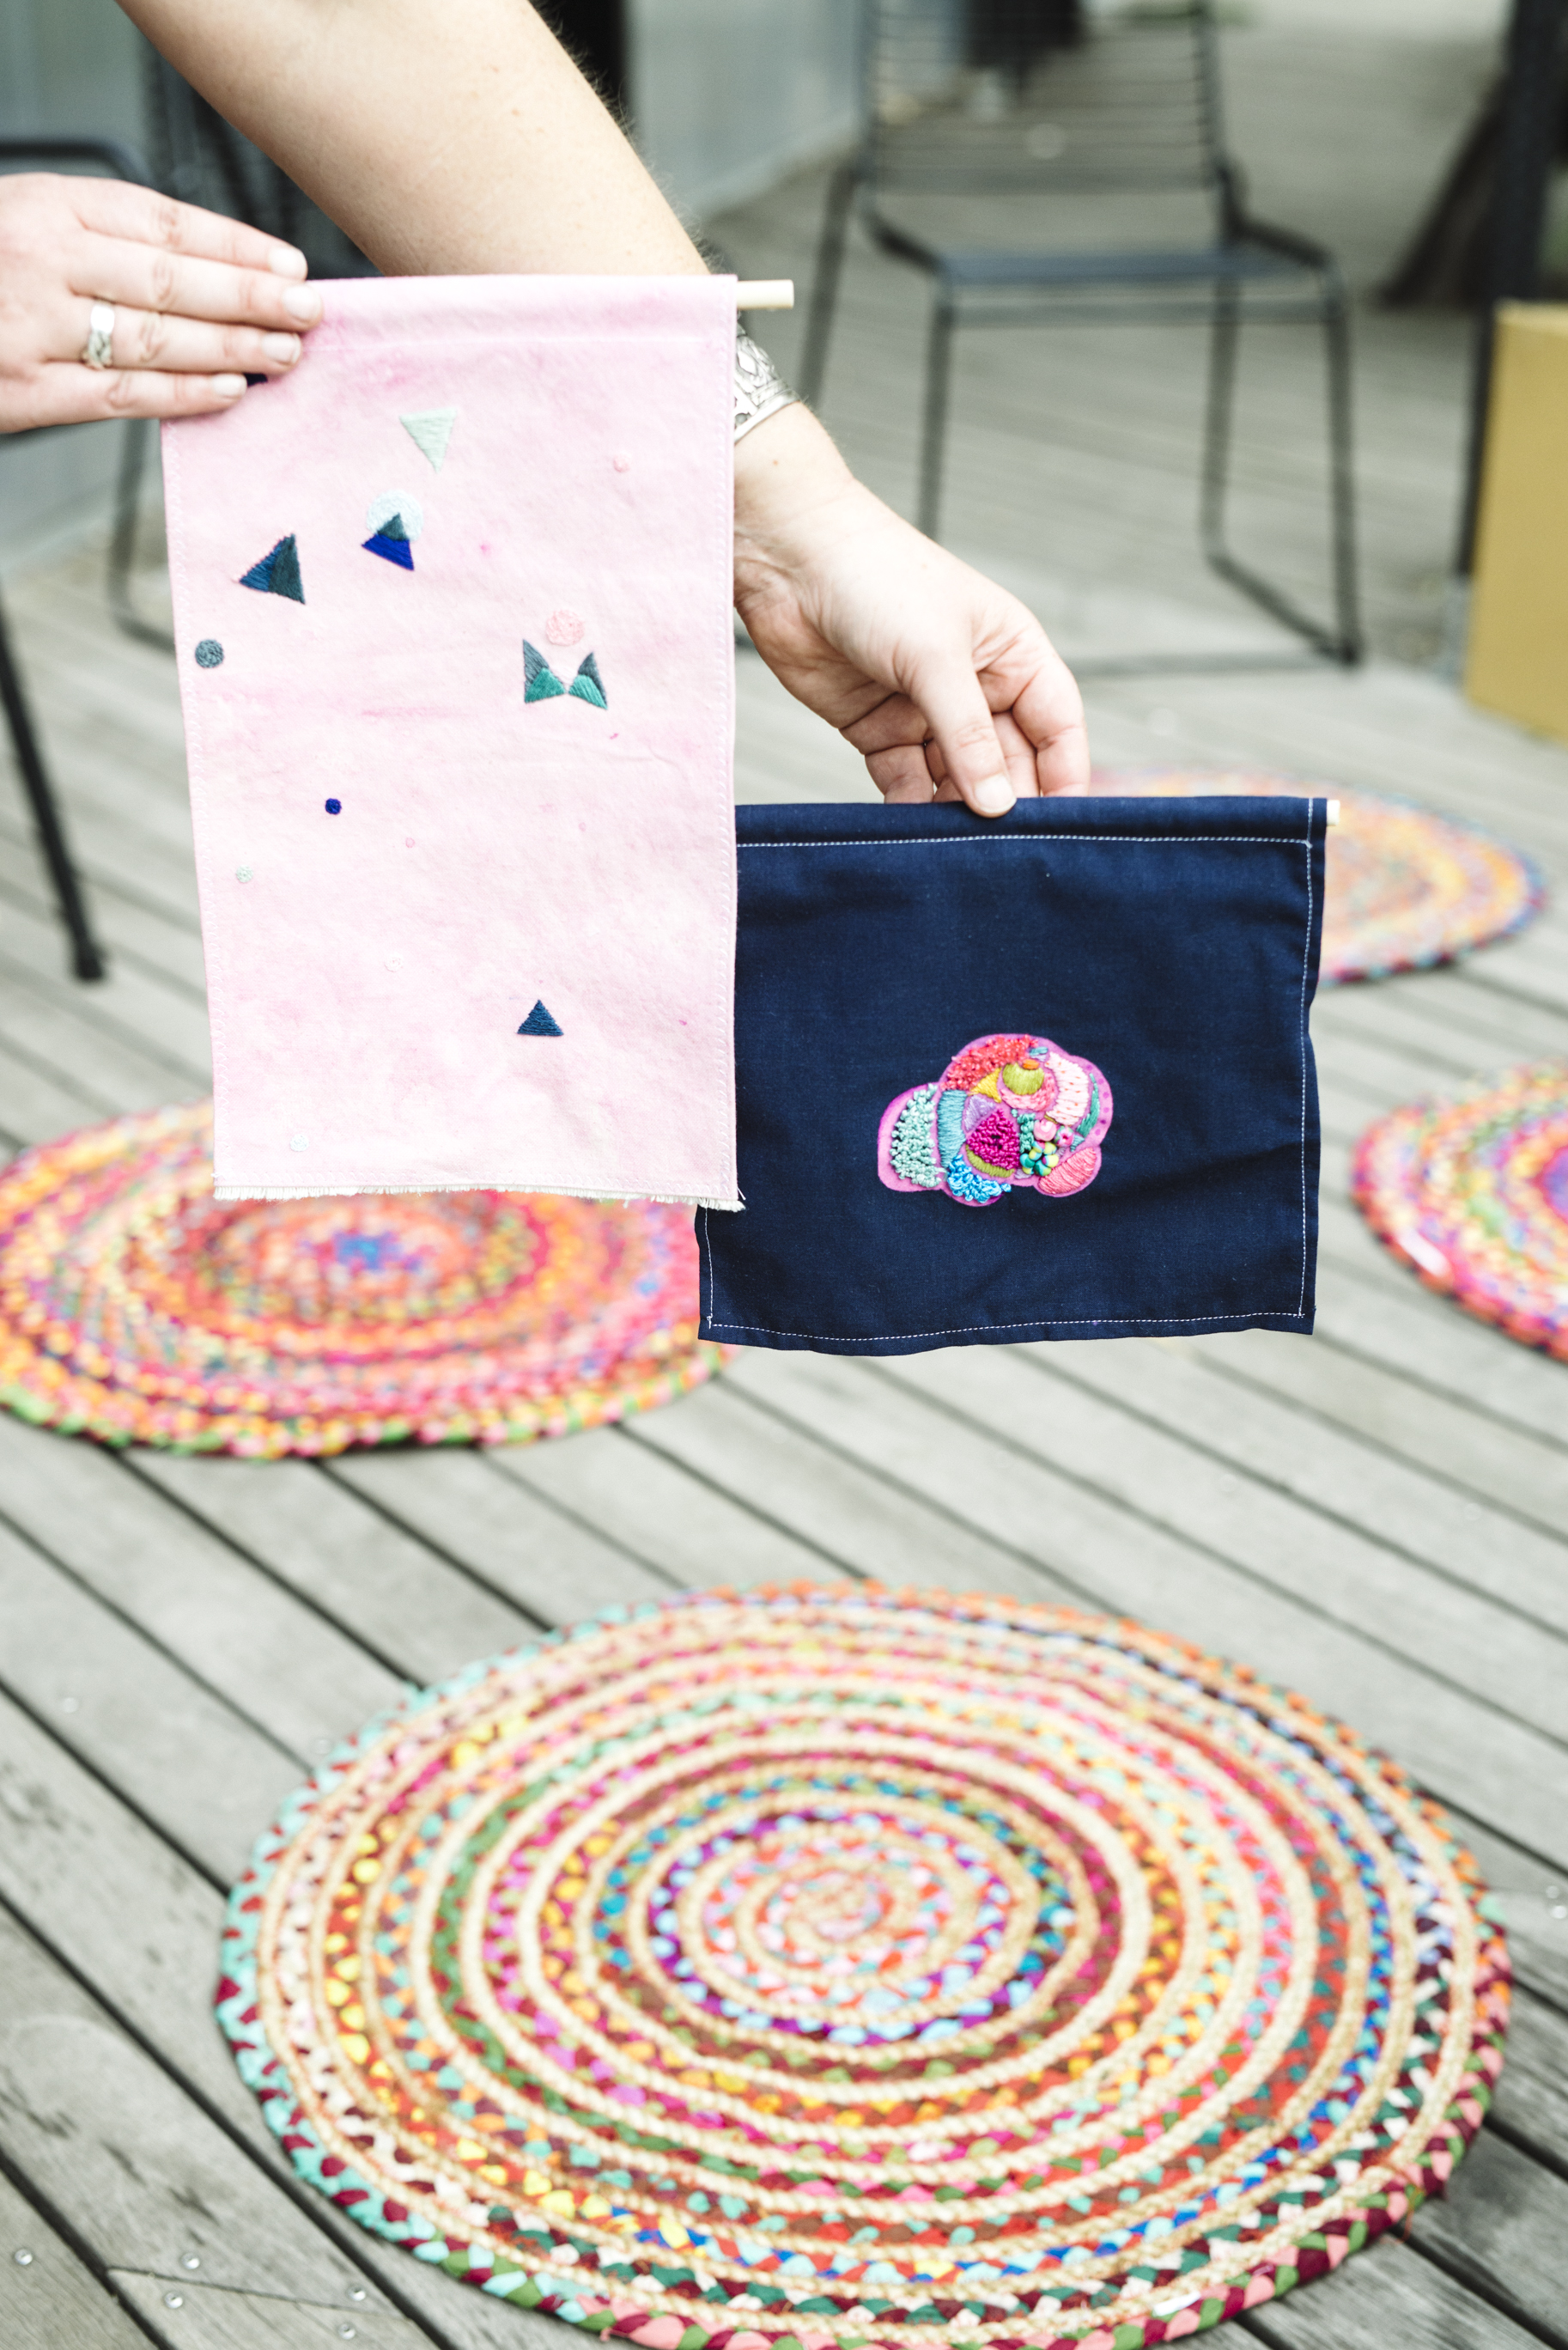 PYHII - Embroidery_36.jpg